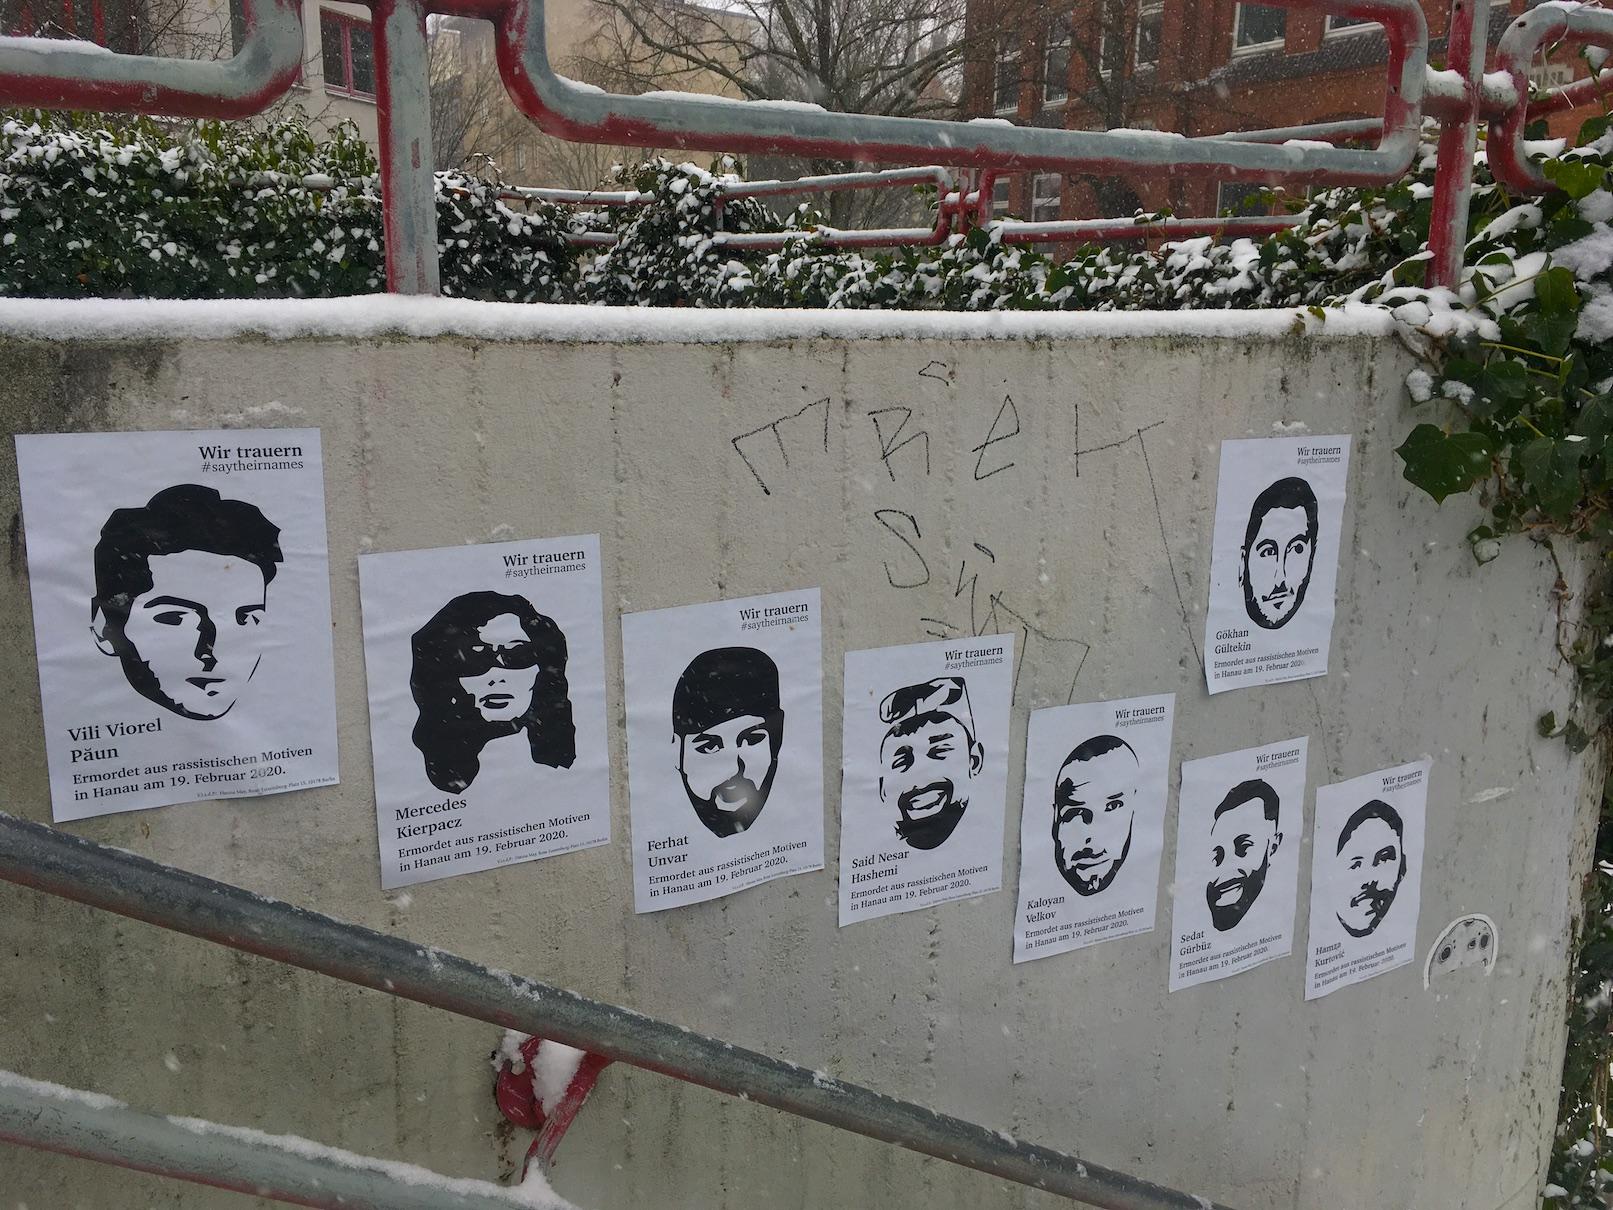 Trauer um Hanau-Plakate am Neuschnee-Tag vom 7. Februar 2021 zum Anschlag von Hanau am 19. Februar 2020